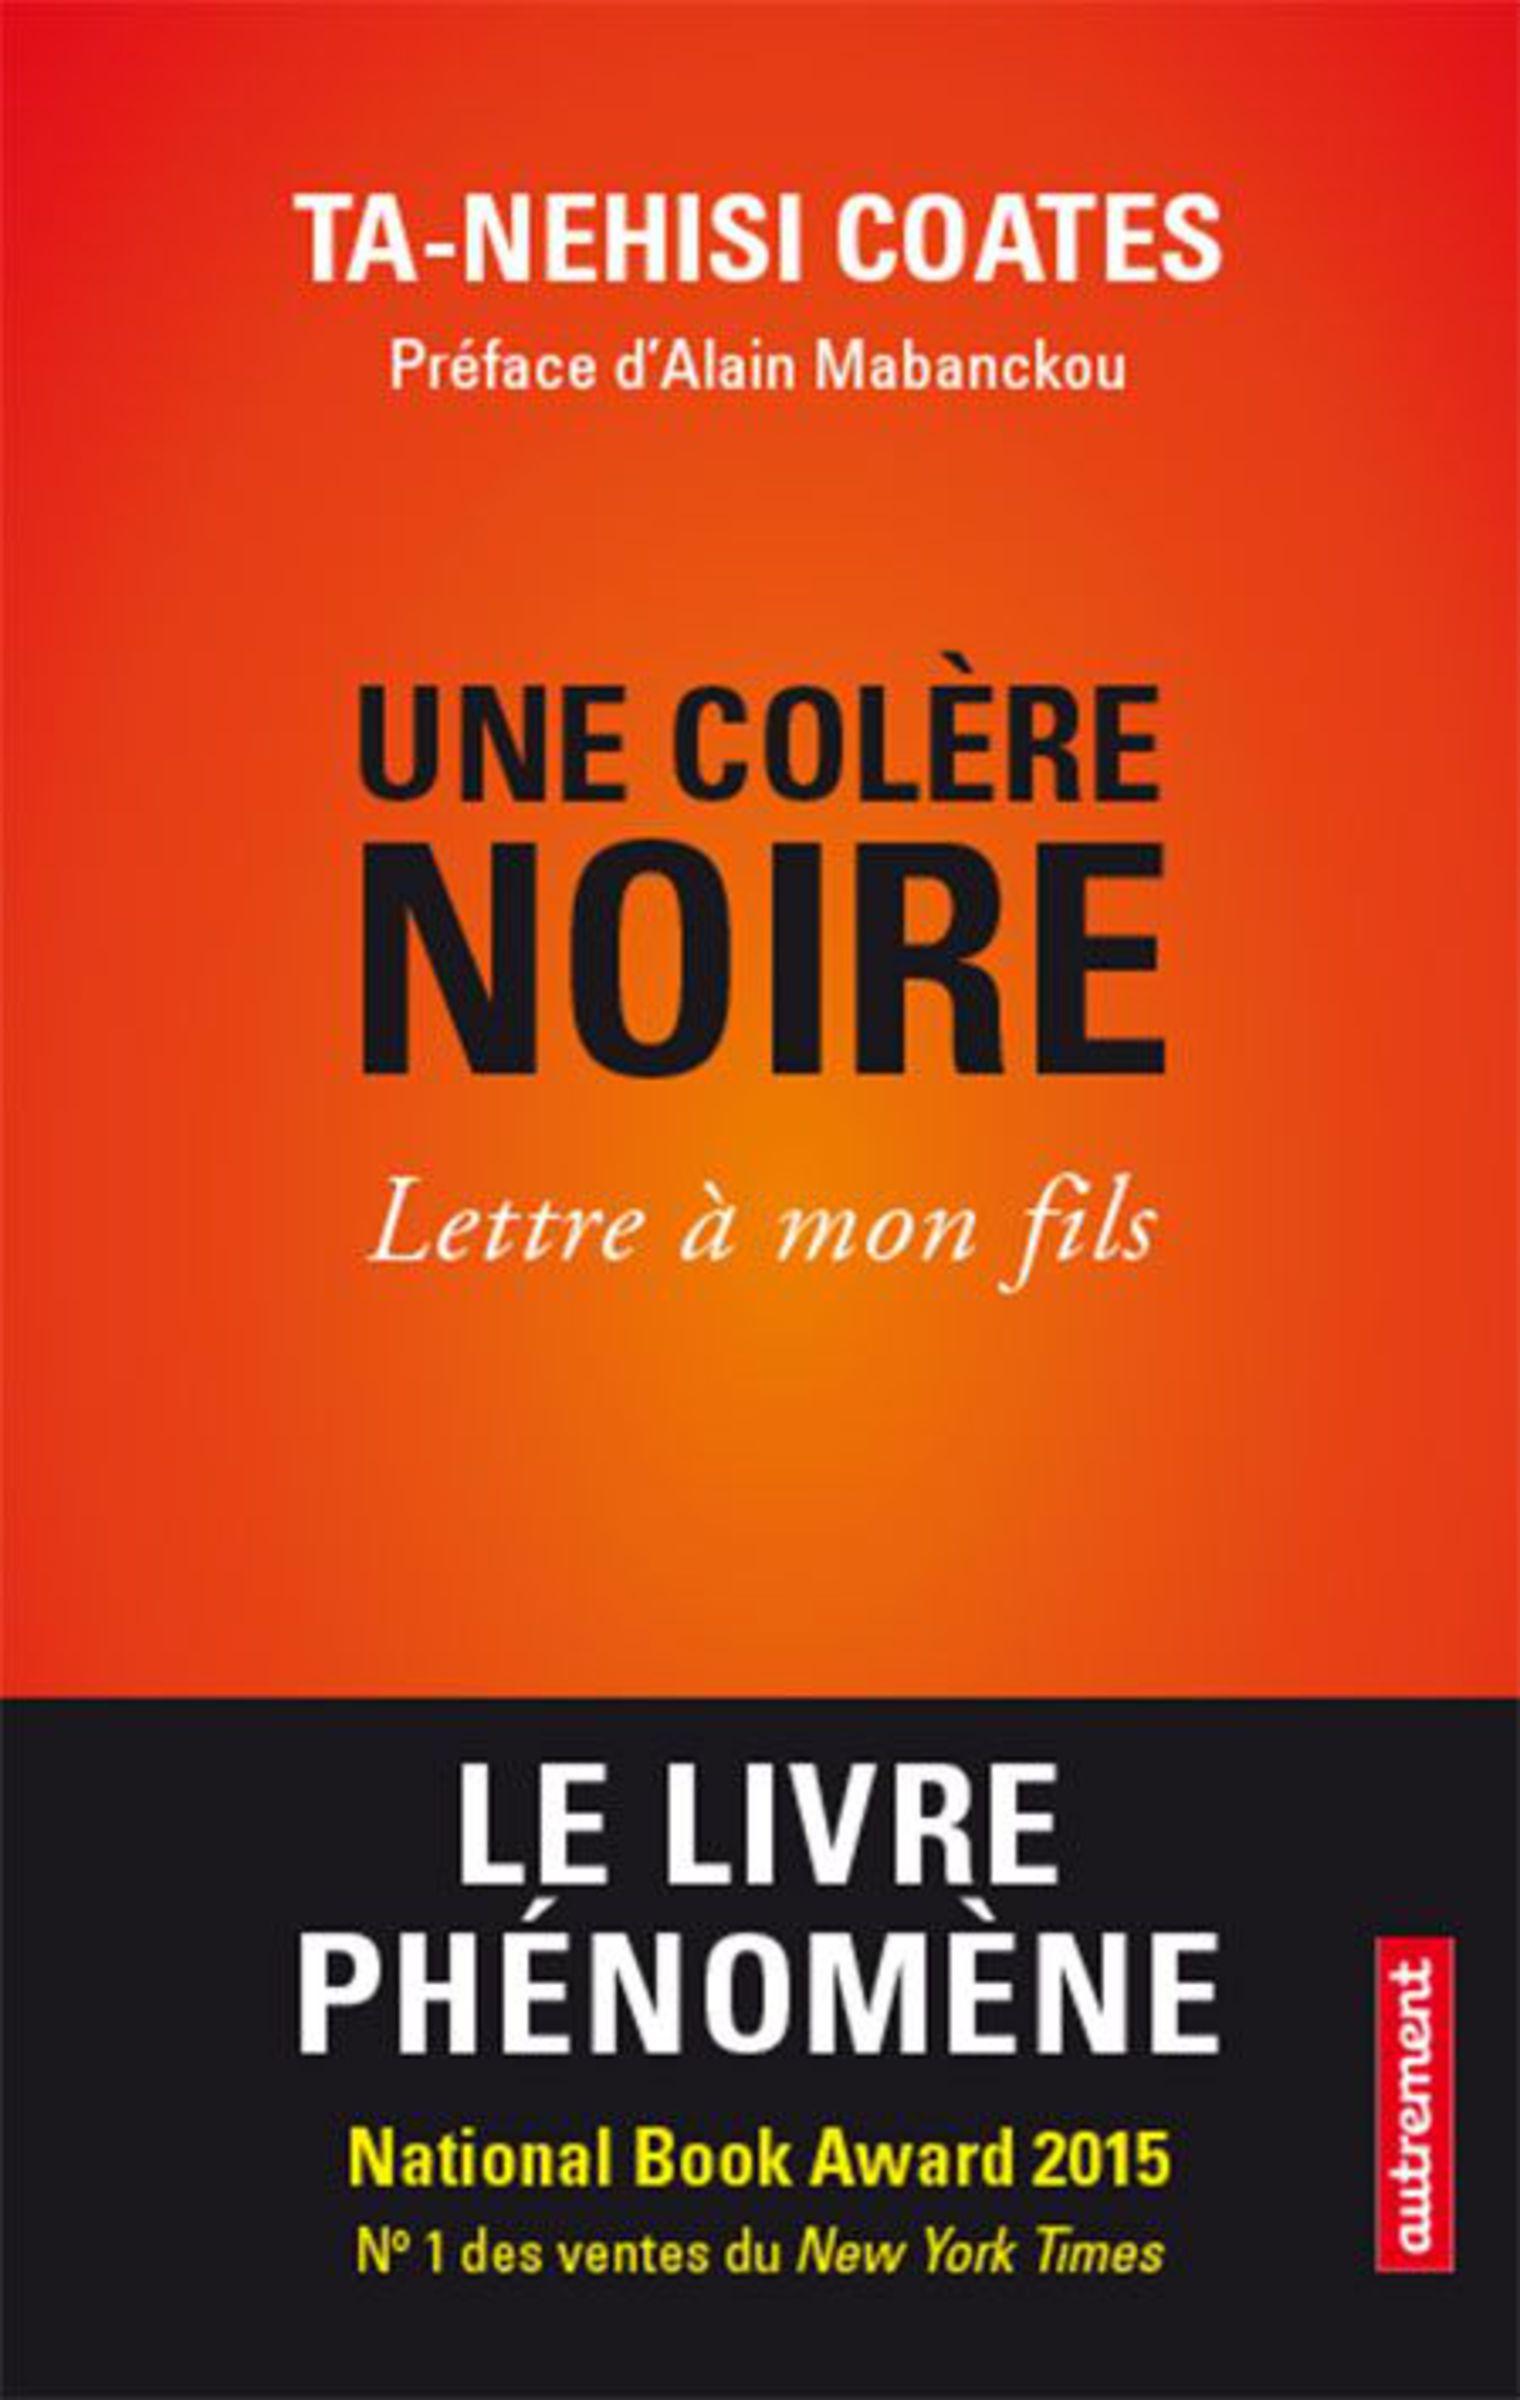 une-colere-noire-between-the-world-and-me-par-ta-nehisi-coates_5499205.jpg